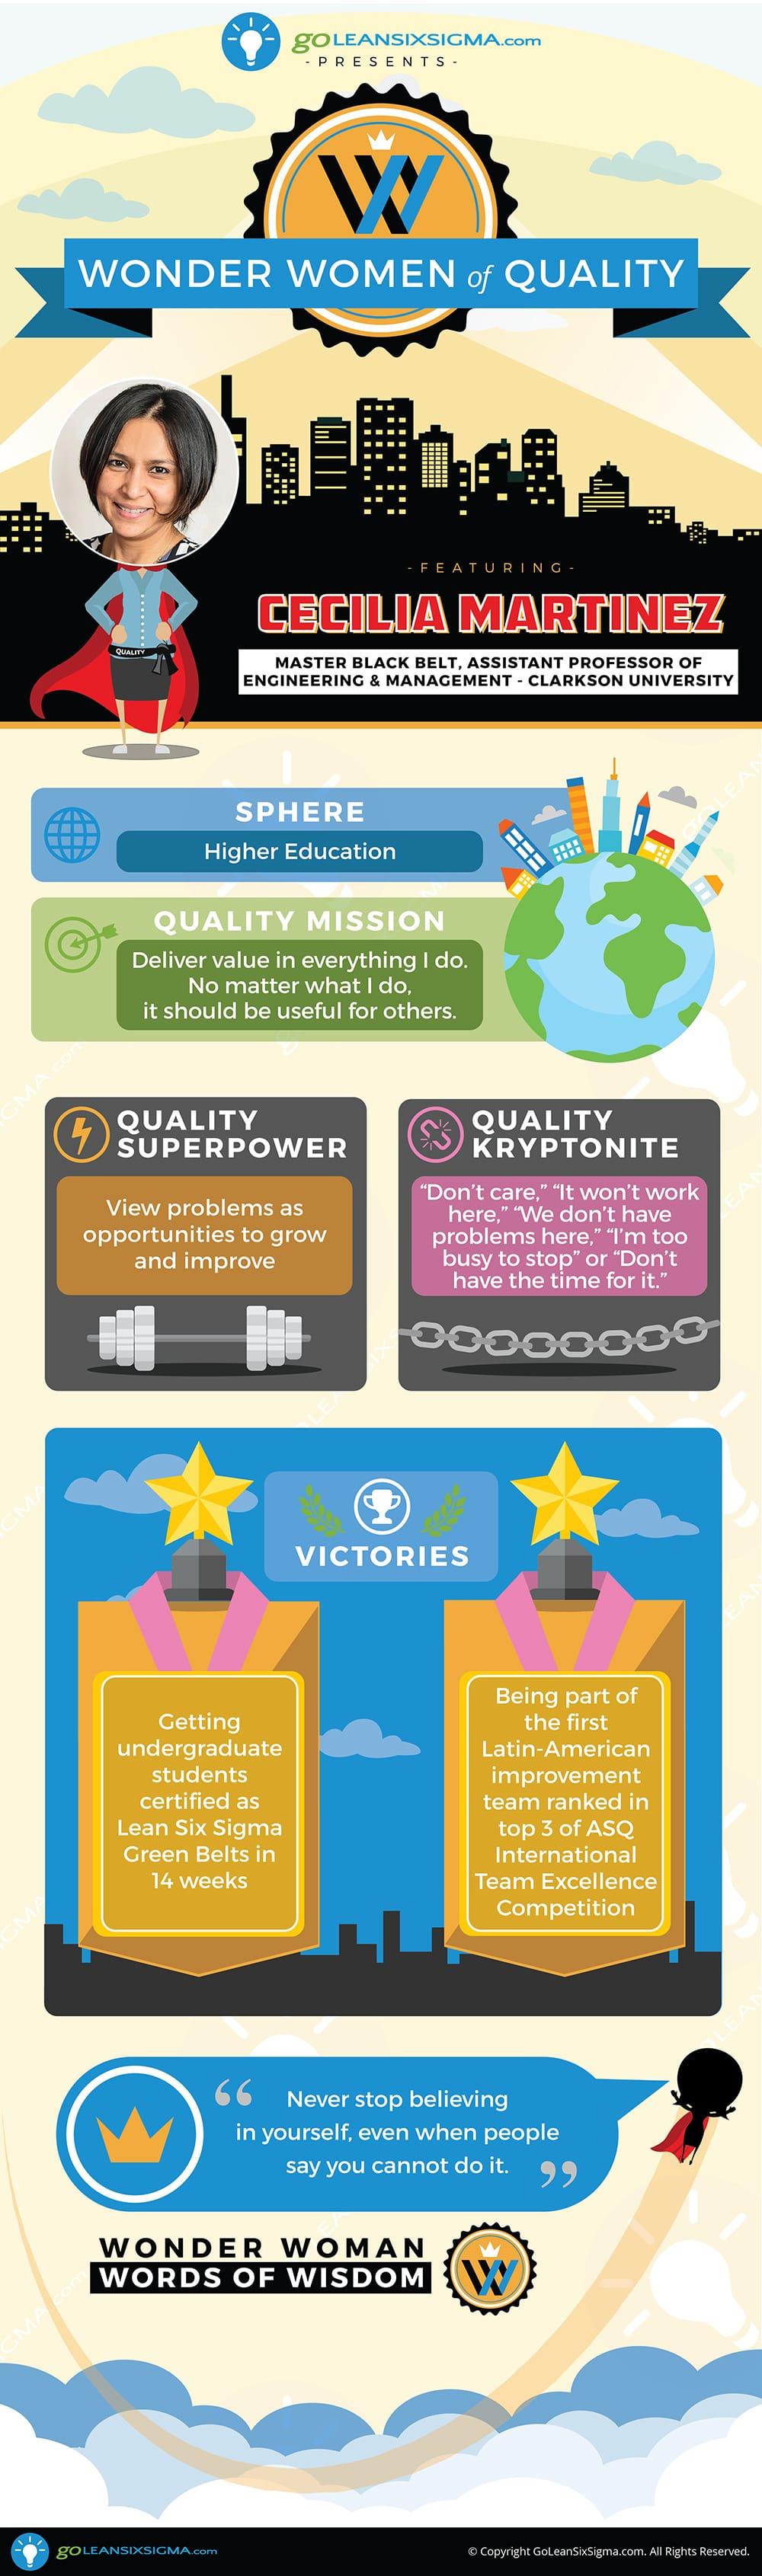 Wonder Women of Quality: Cecilia Martinez - GoLeanSixSigma.com